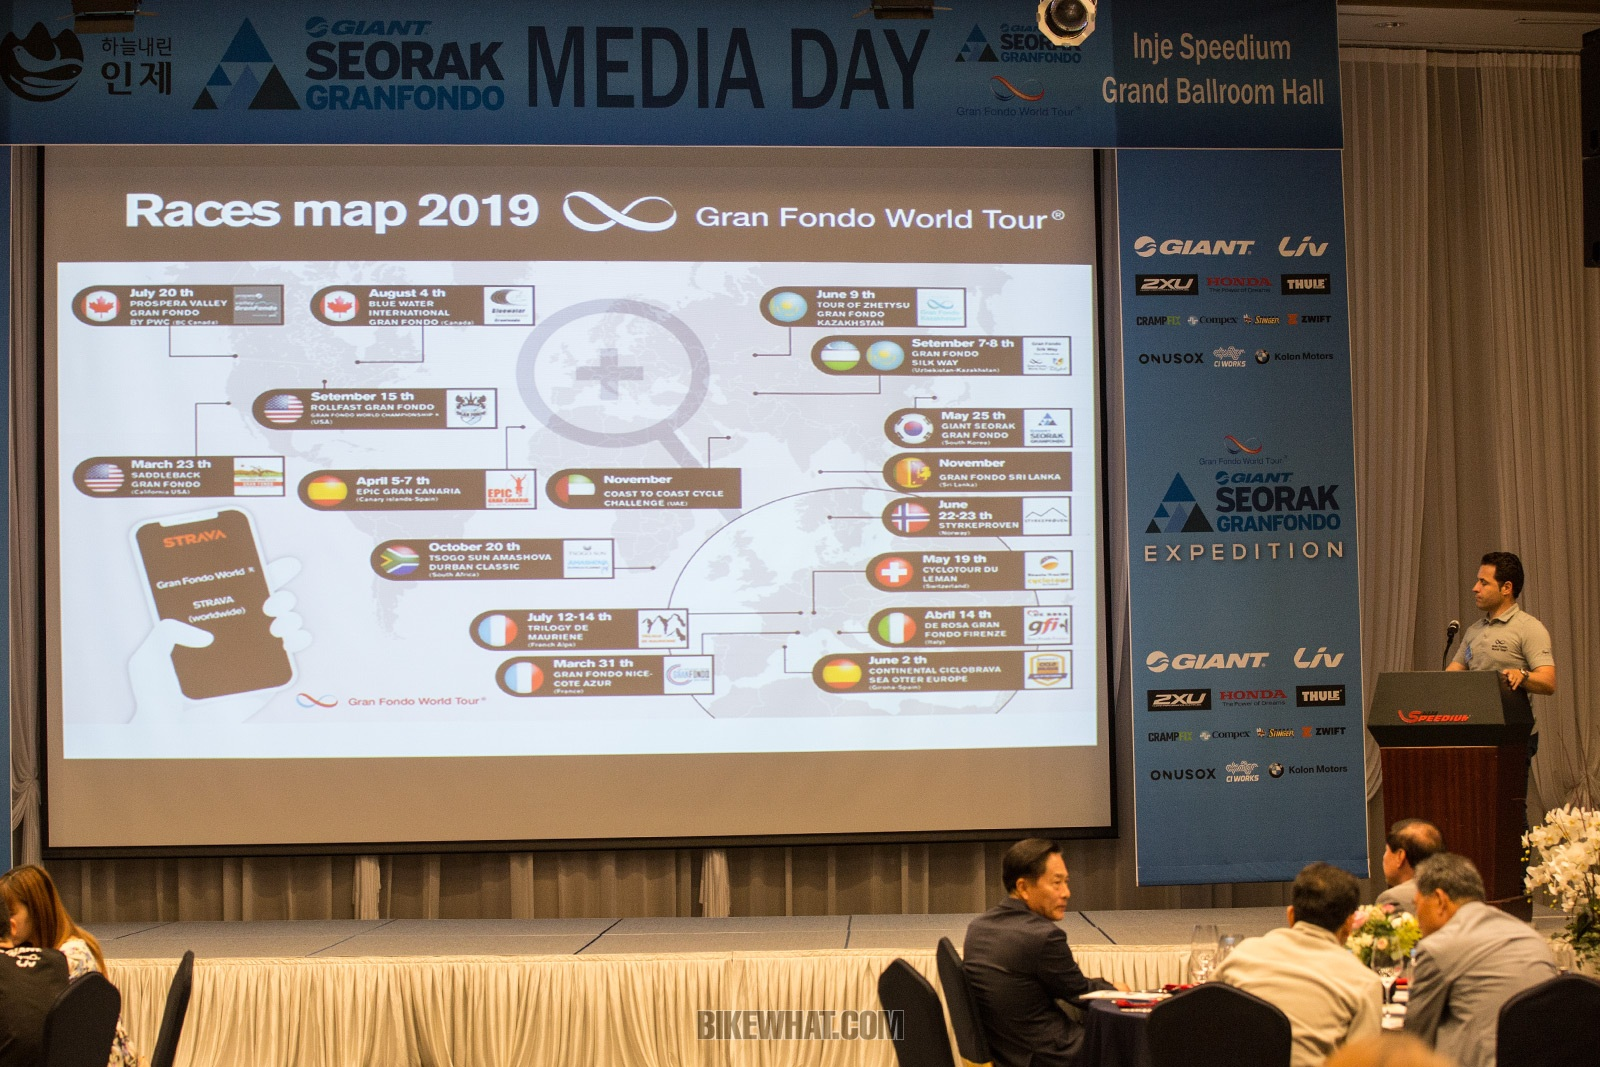 News_2019_Giant_Seolak_GF_4.jpg